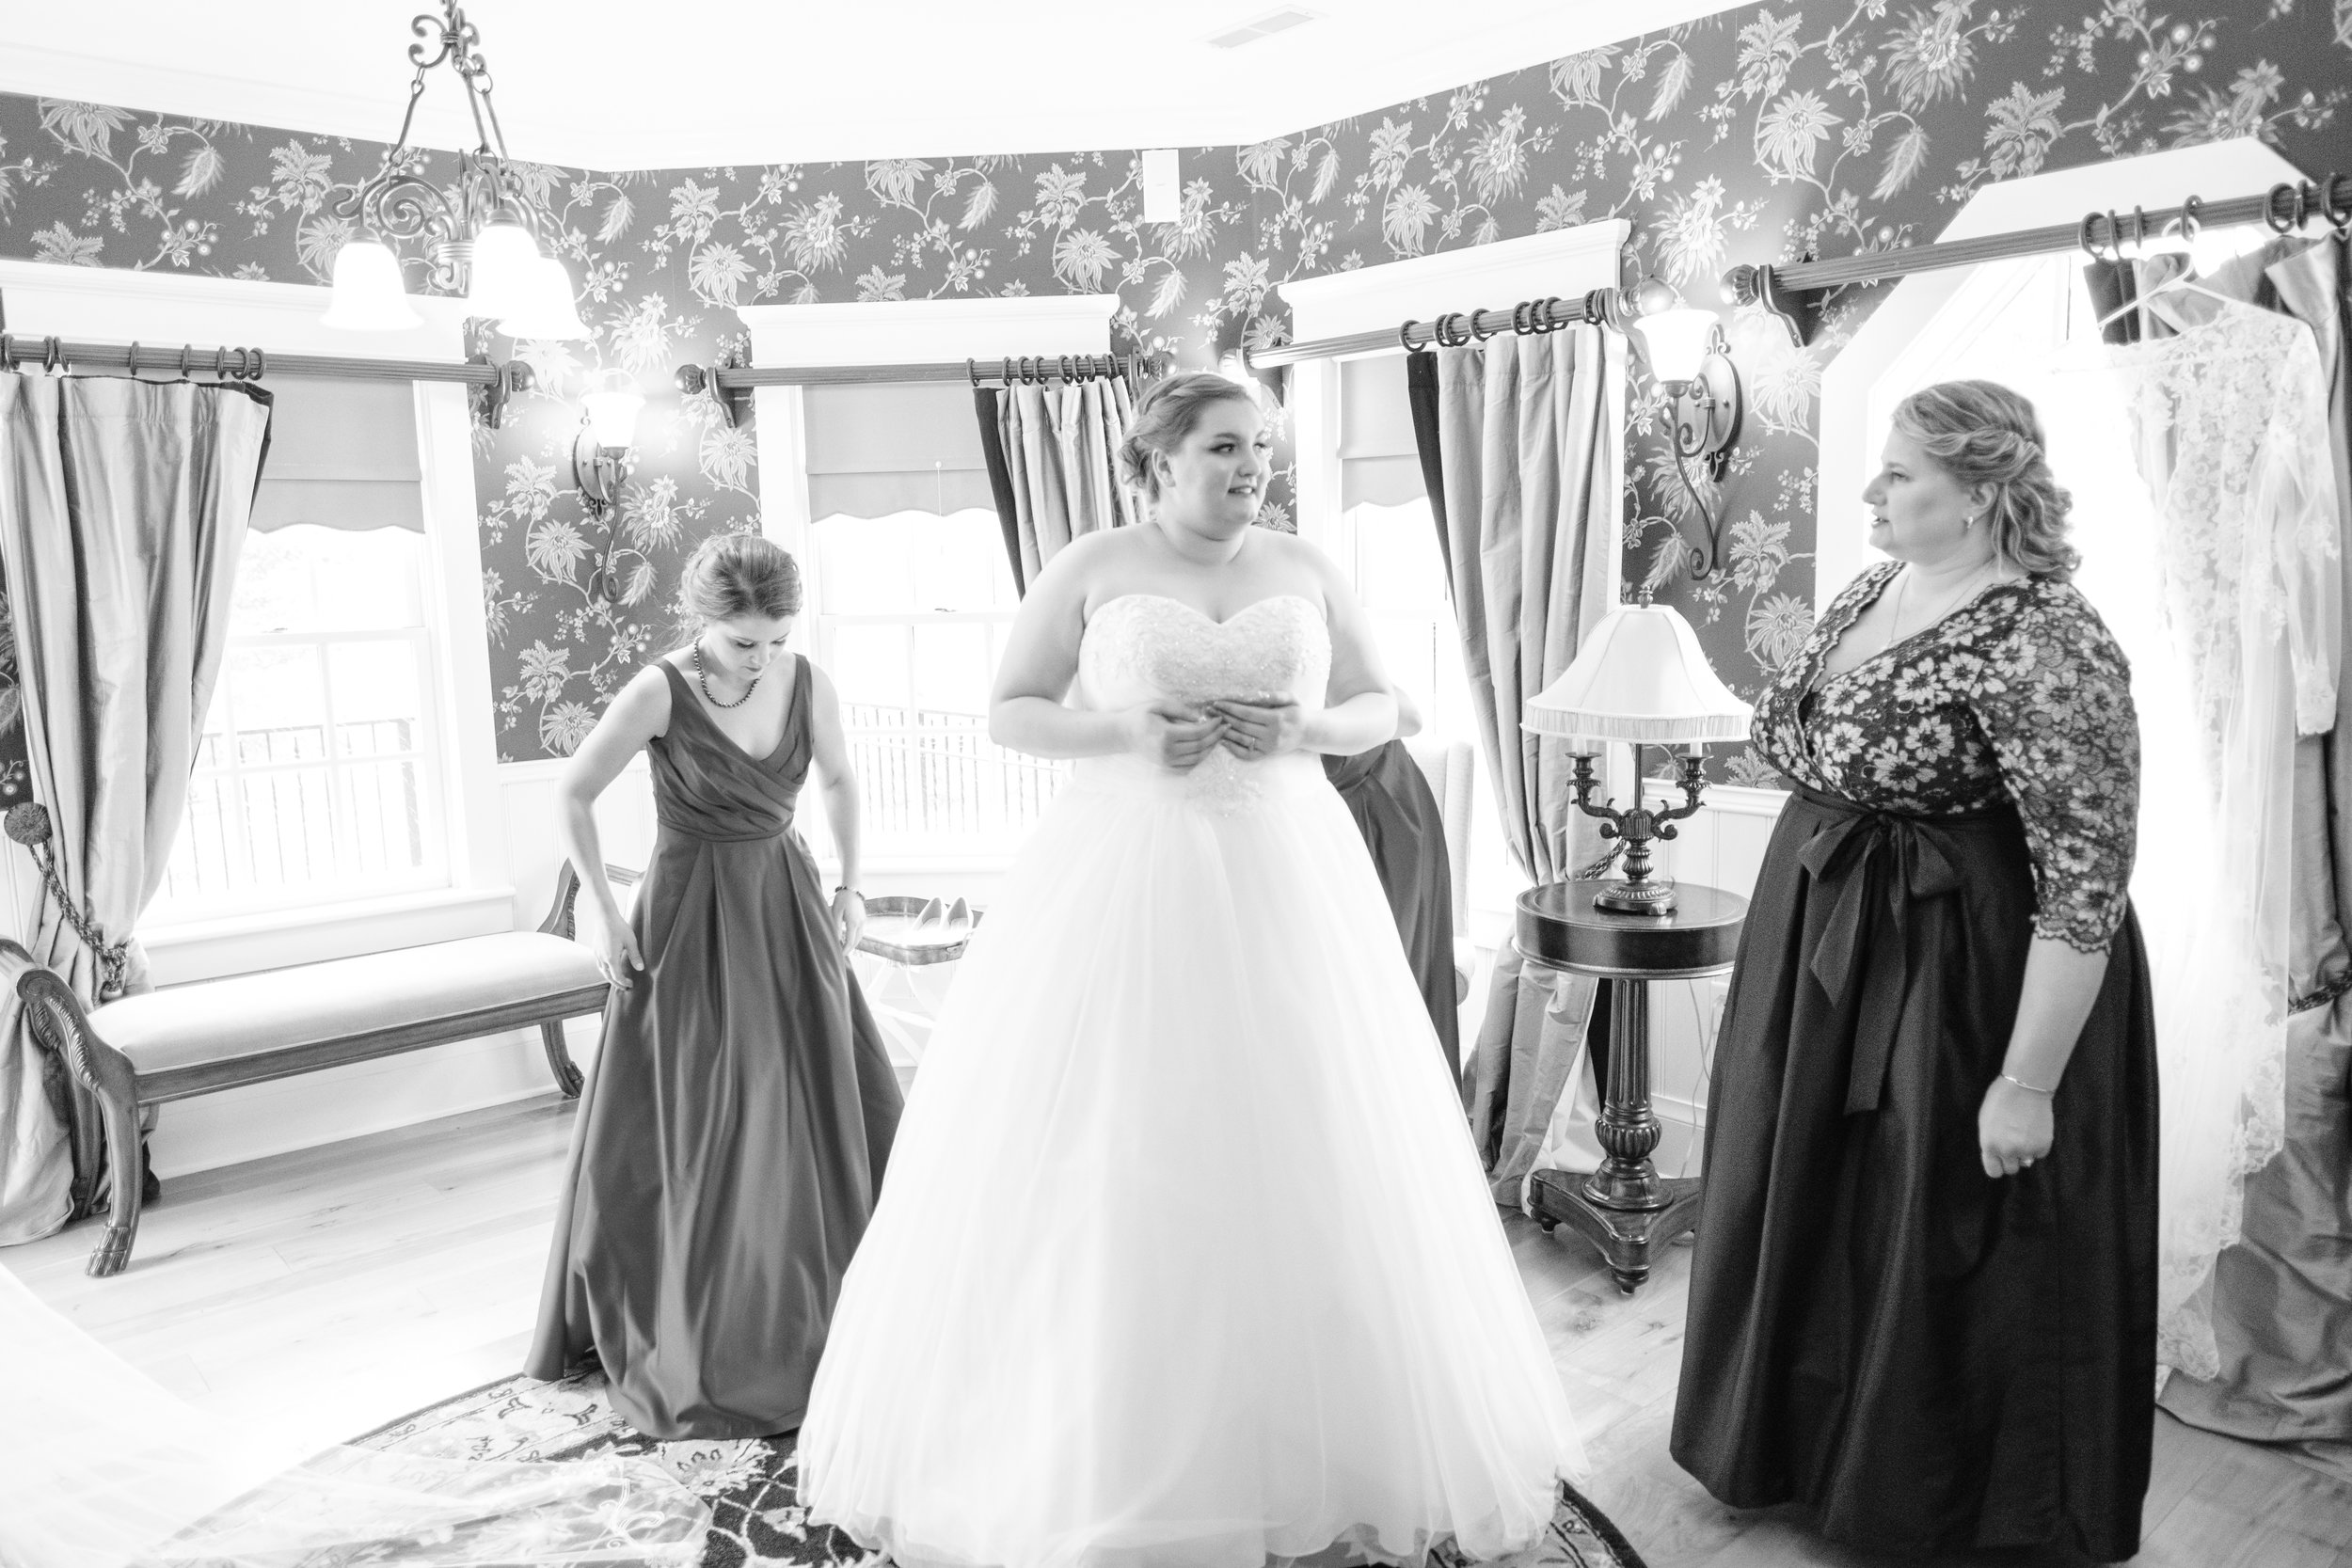 18-12-28 Corinne-Henry-Pavilion-Wedding-41.jpg